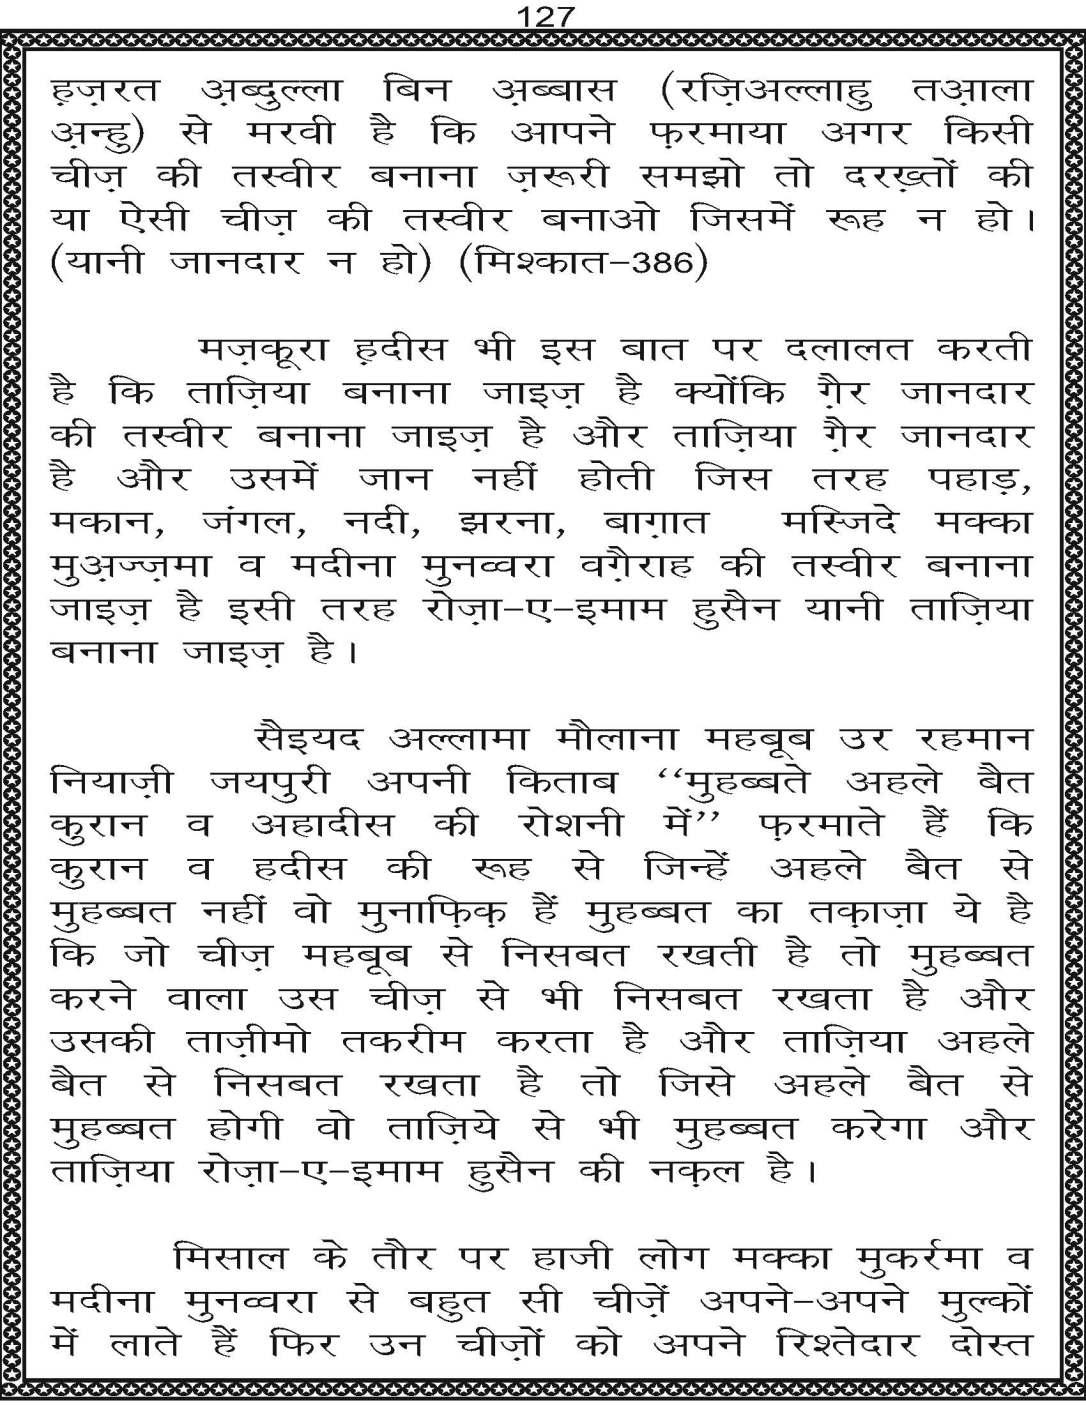 AzmateTaziyadari_Page_127